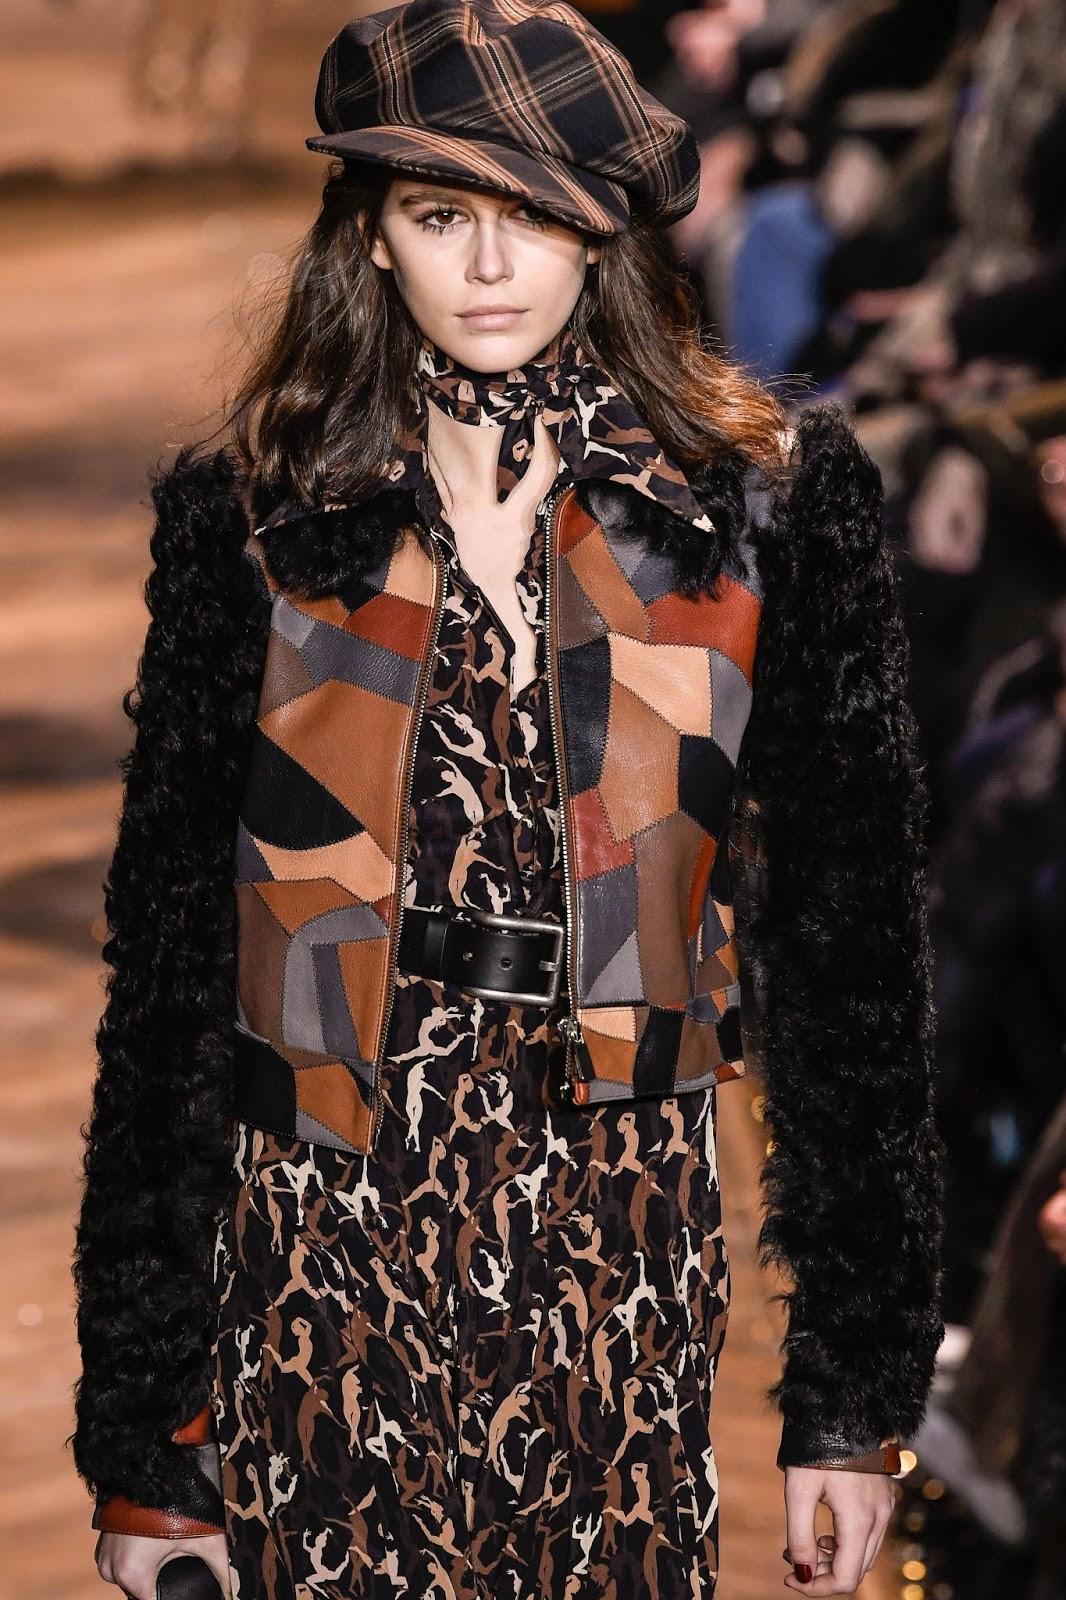 Kaia Gerber - Michael Kors fashion show Fall Winter 2019 in New York - 02/13/2019